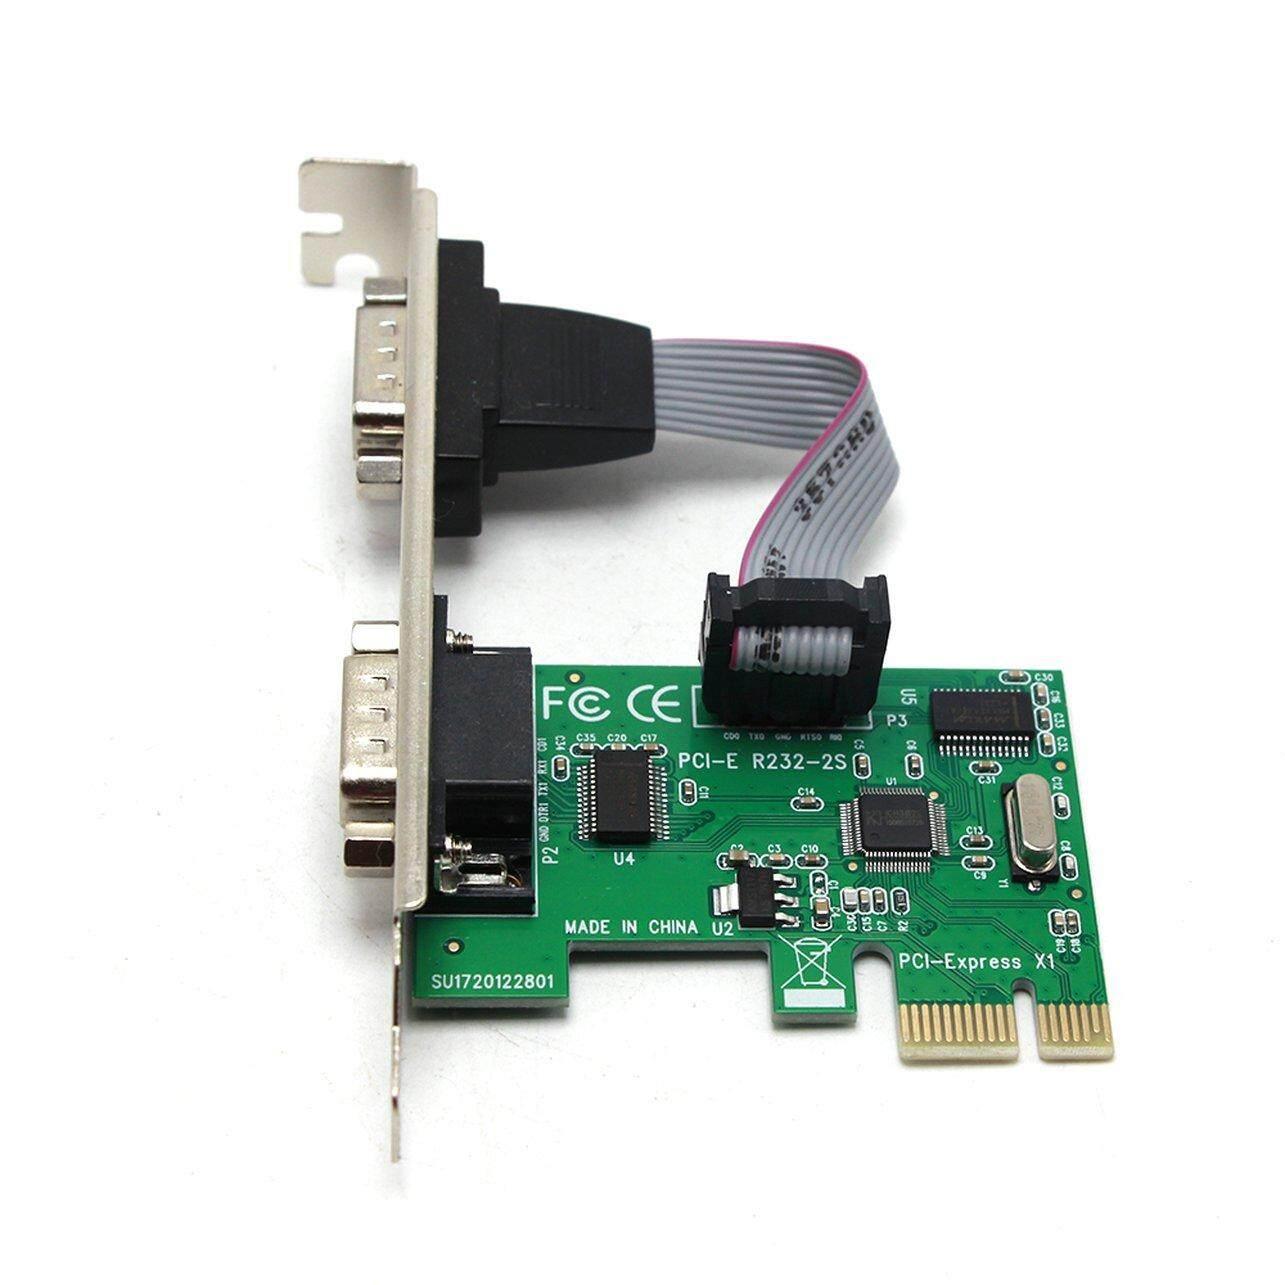 GOOD SHOP Pci-E Serial Port Card Pci-E To Serial Port Card R232 Interface Com Port Card